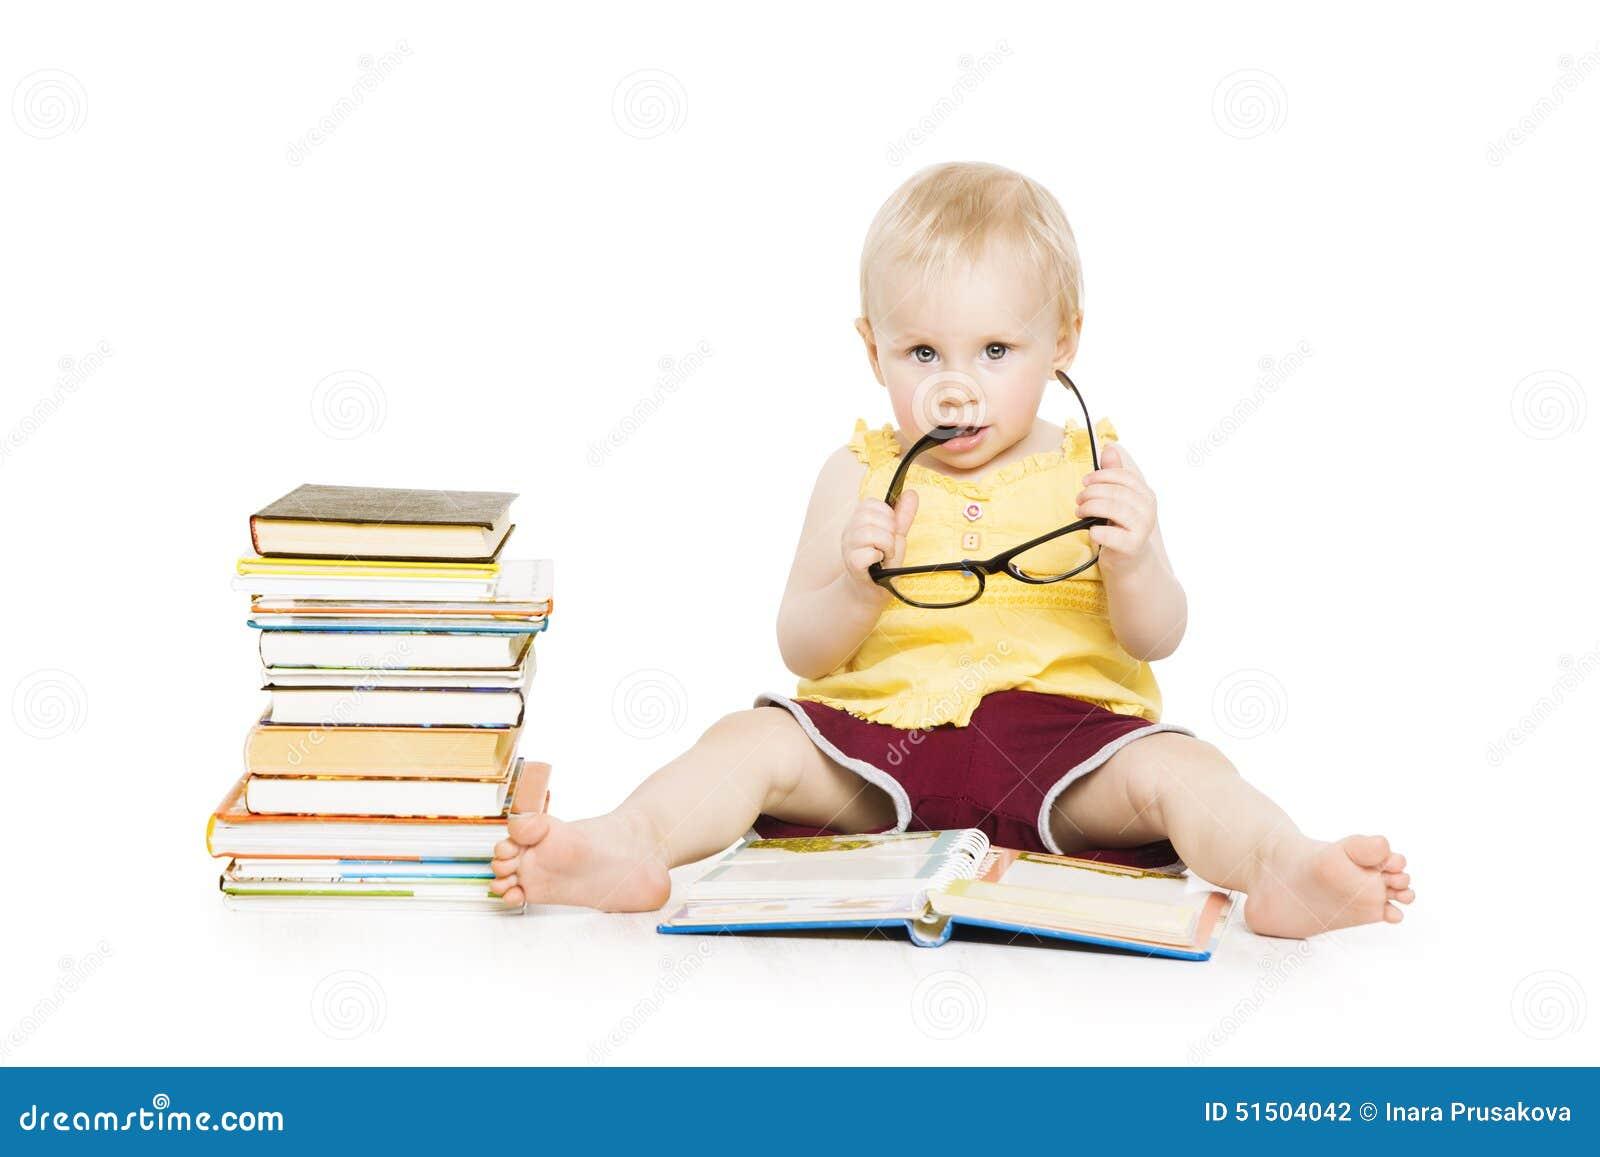 Easy Read Kid Books